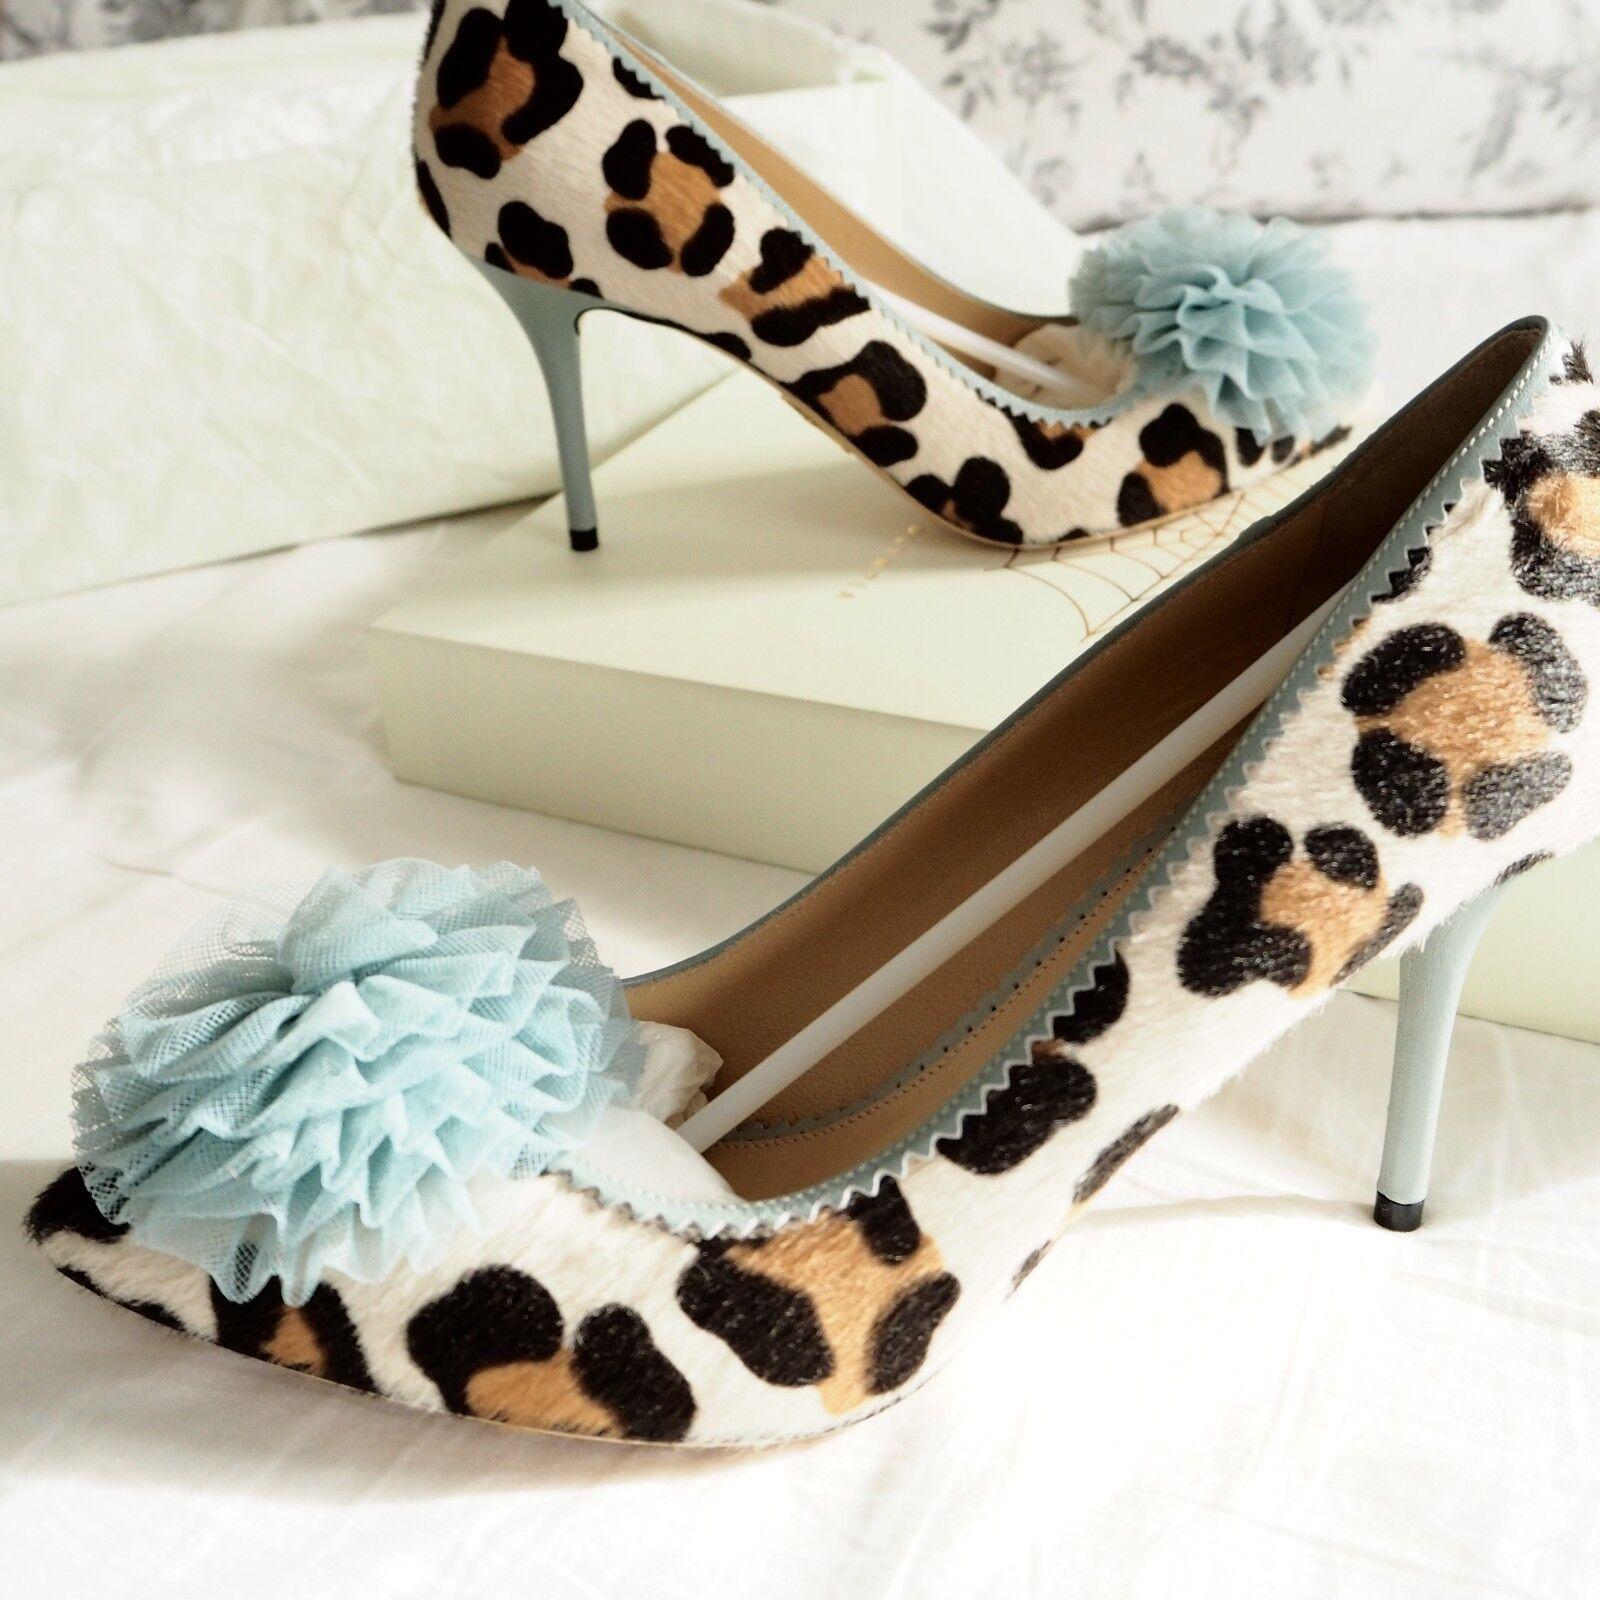 Charlotte Charlotte Charlotte Olympia Wedding Leopard Print Desiree Heel schuhe Größe 36.5 UK3.5 BNIB 110264